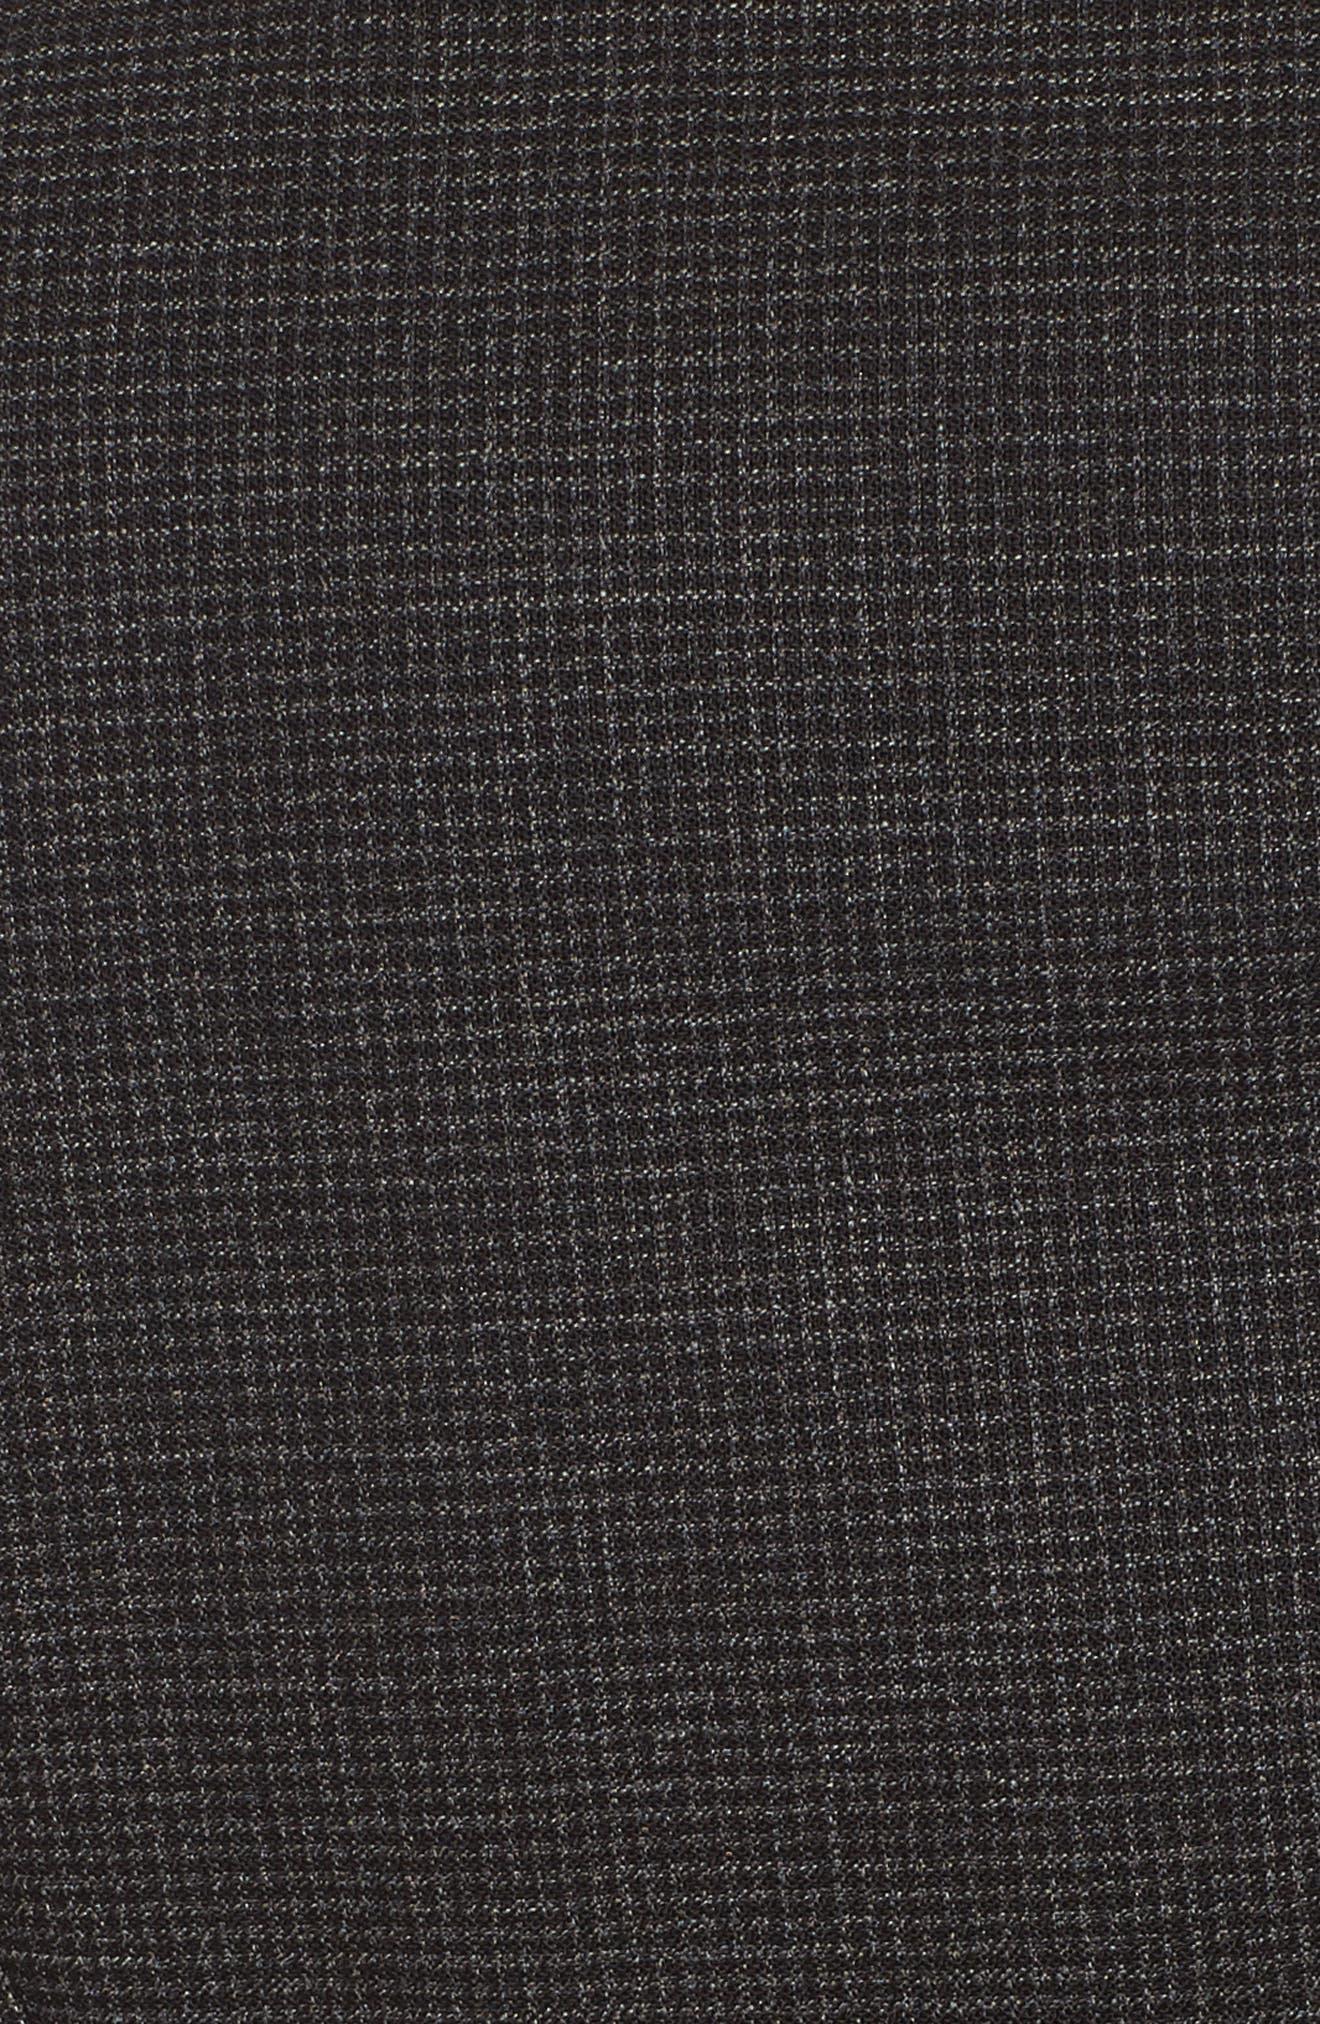 Jewisa Wool Jacket,                             Alternate thumbnail 6, color,                             006